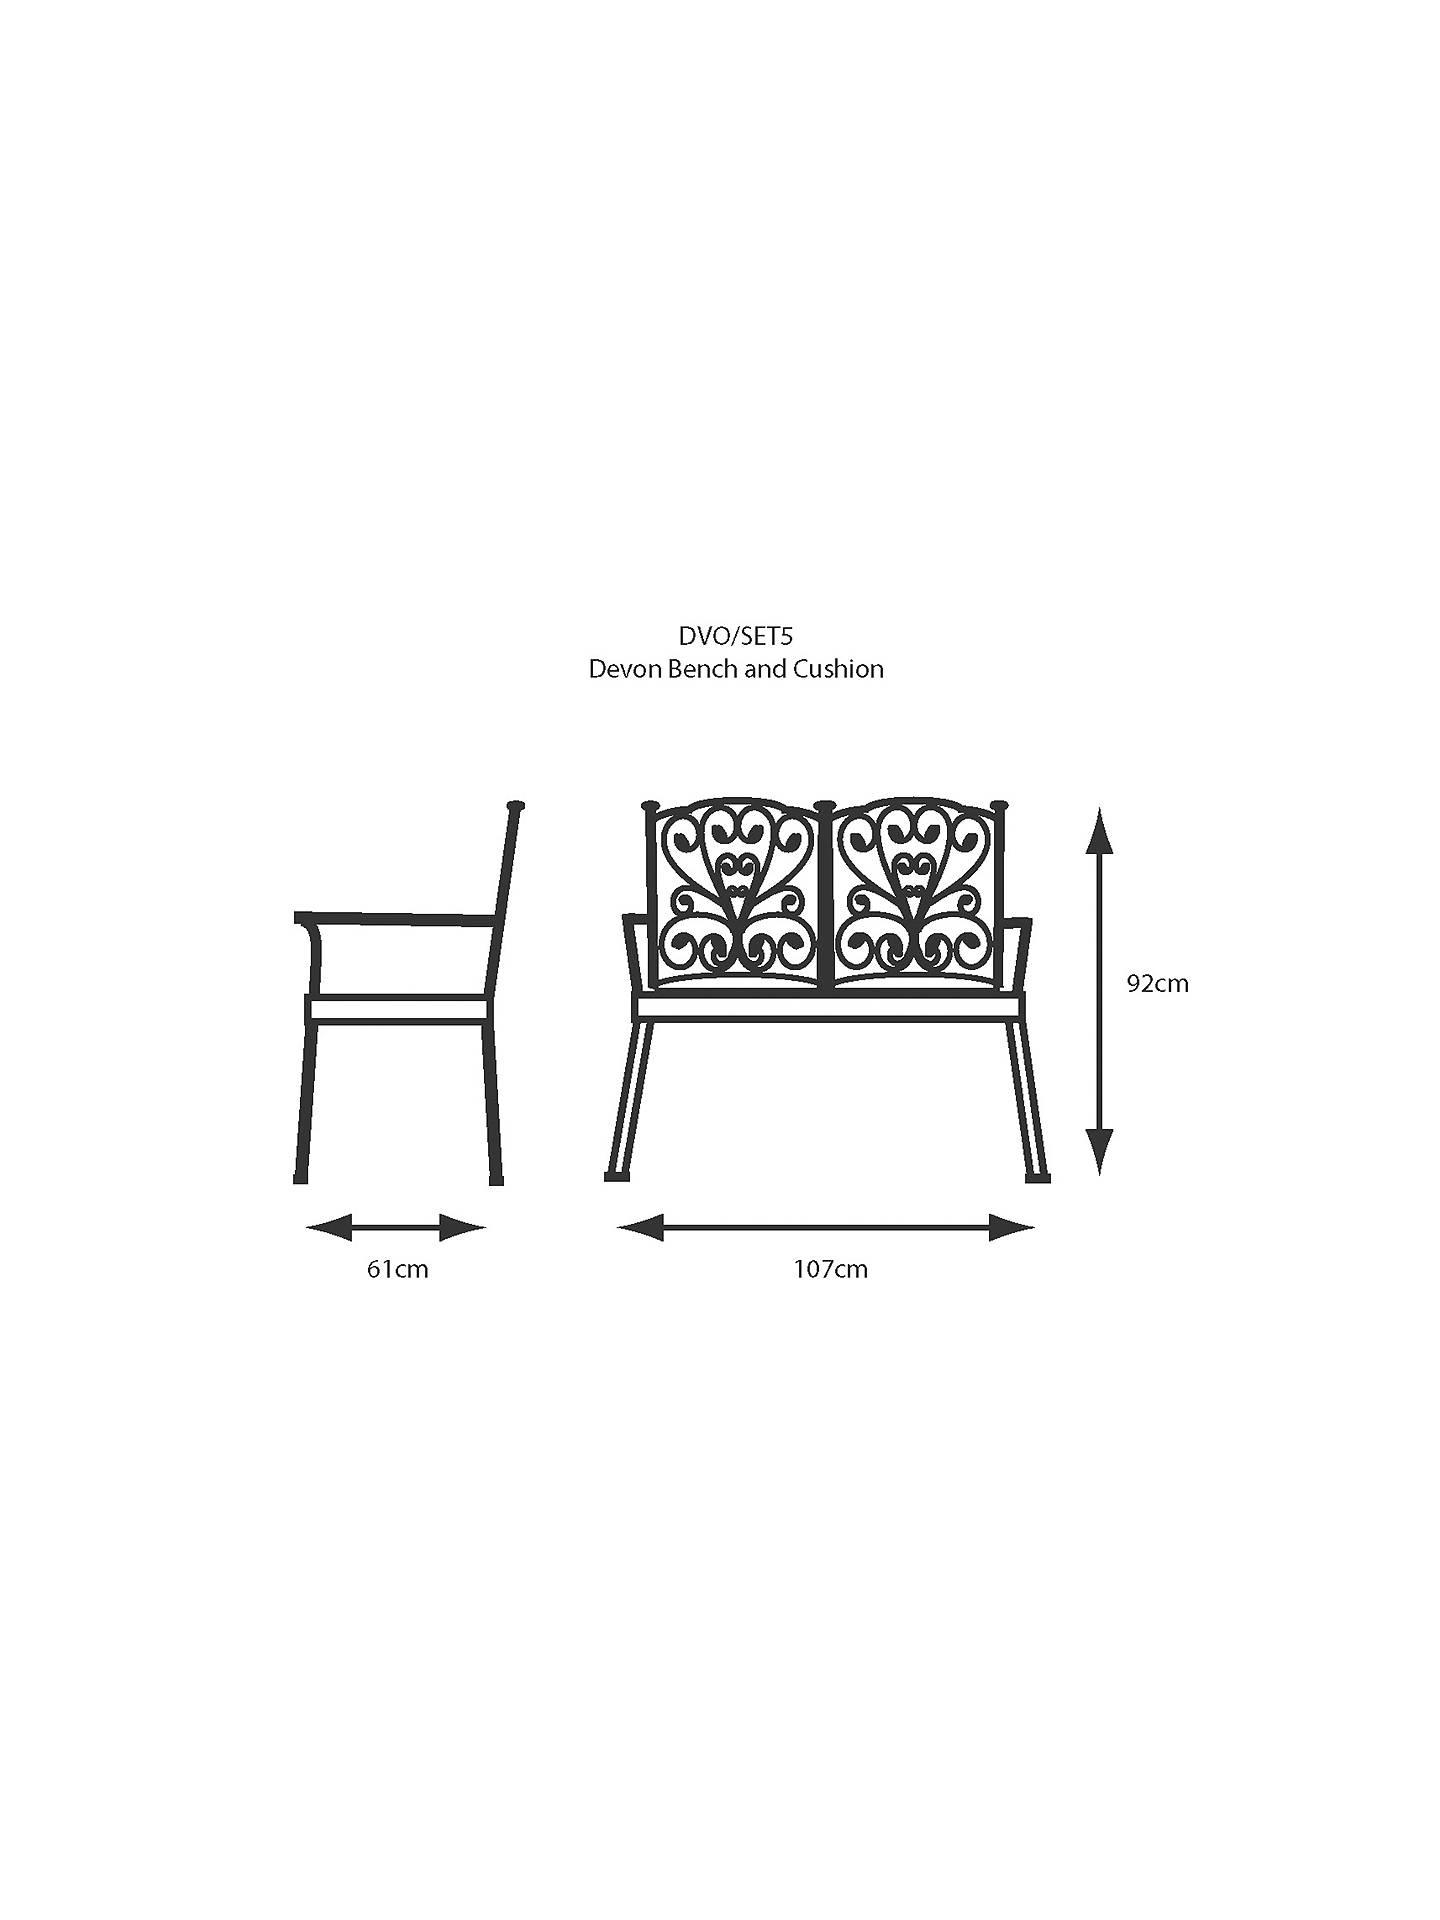 Remarkable Lg Outdoor Devon Bench And Cushion Bronze Creativecarmelina Interior Chair Design Creativecarmelinacom